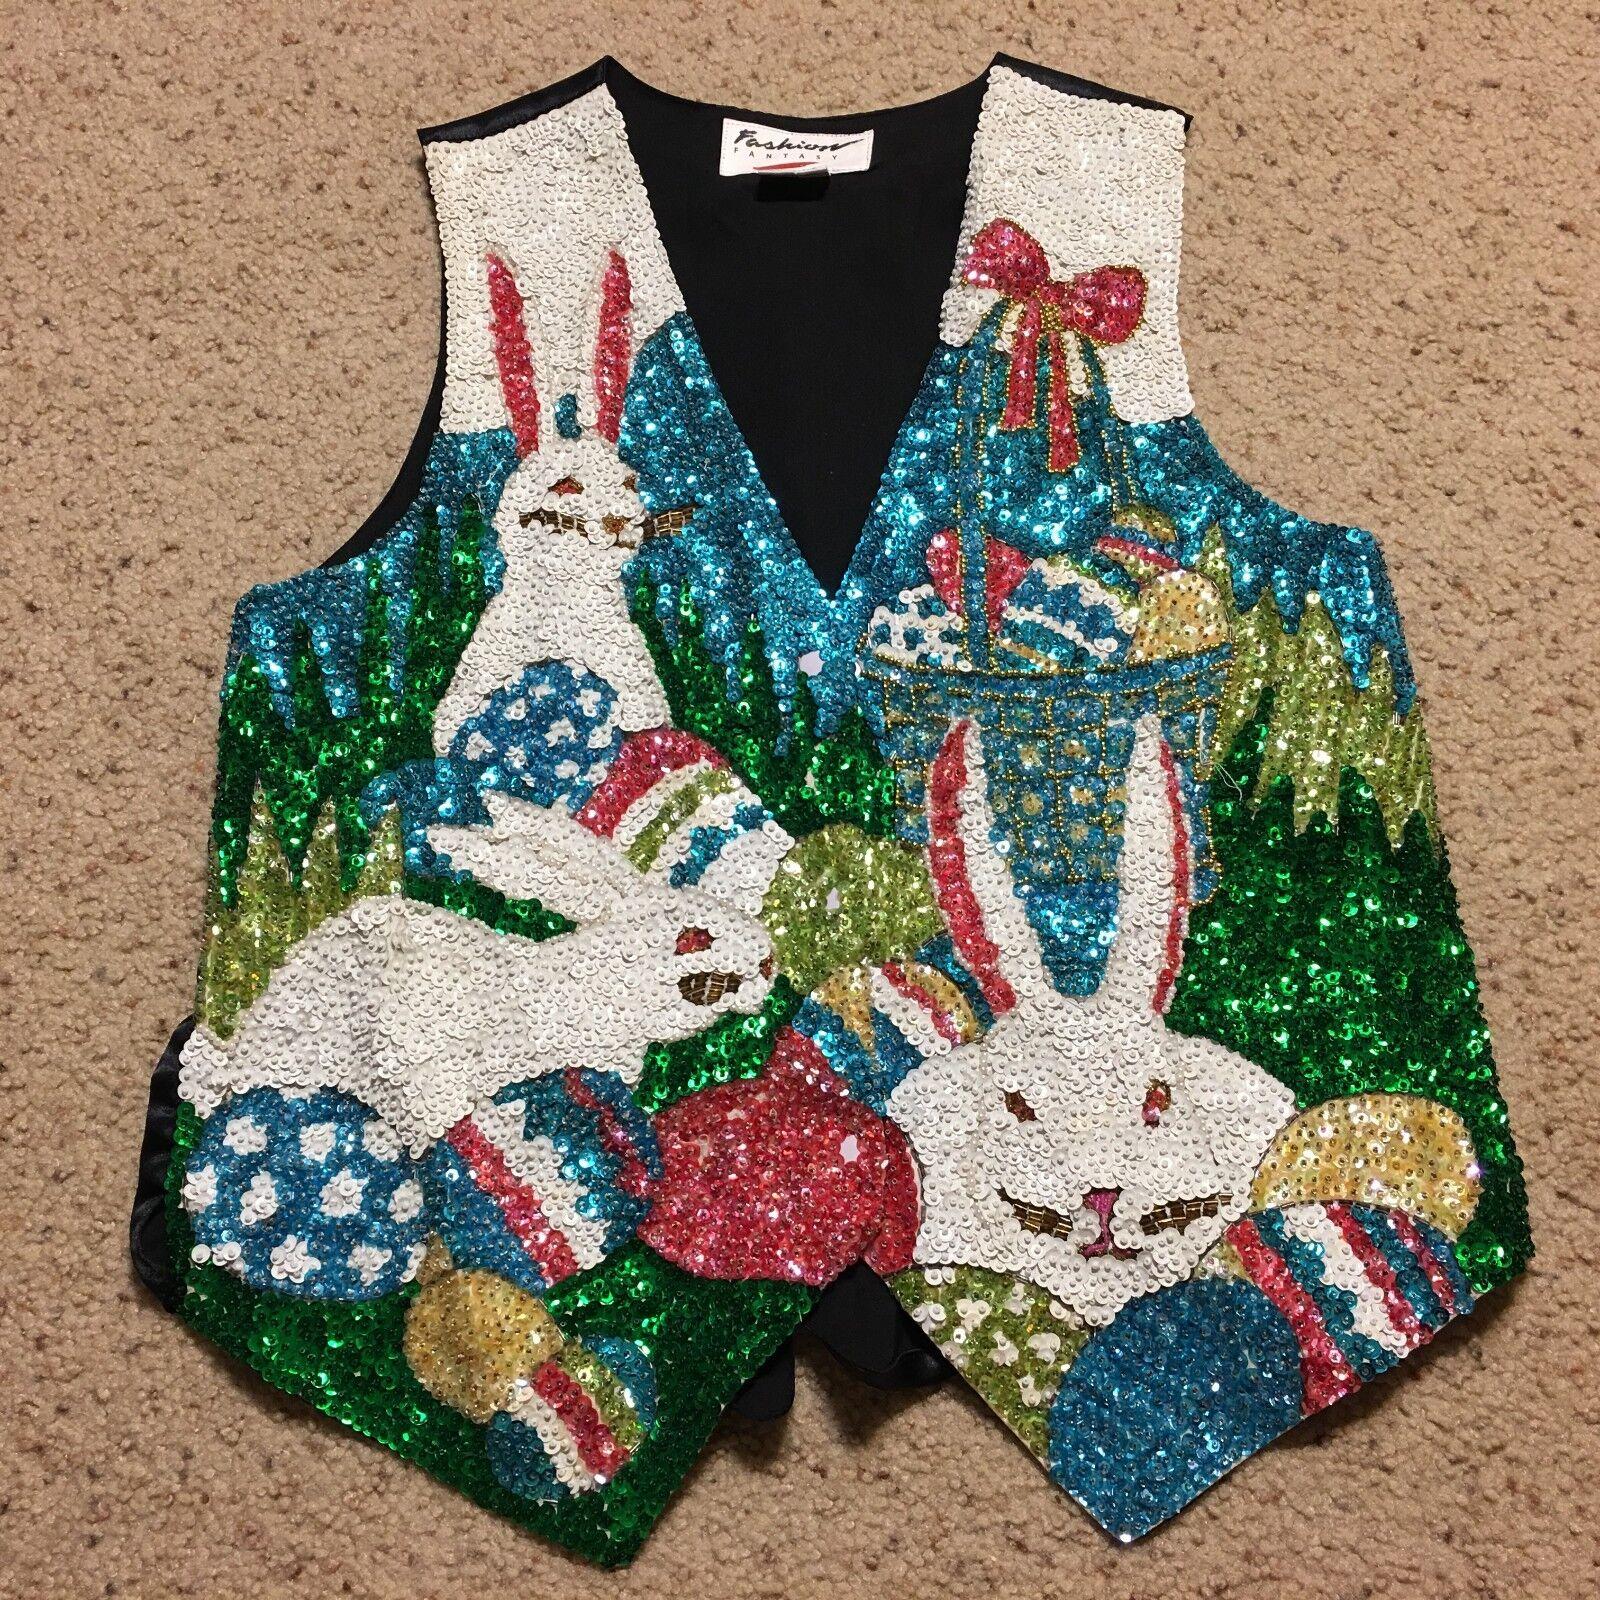 Fashion Fantasy Womens Size S Vest Easter Rabbits Eggs Sequin Vintage c